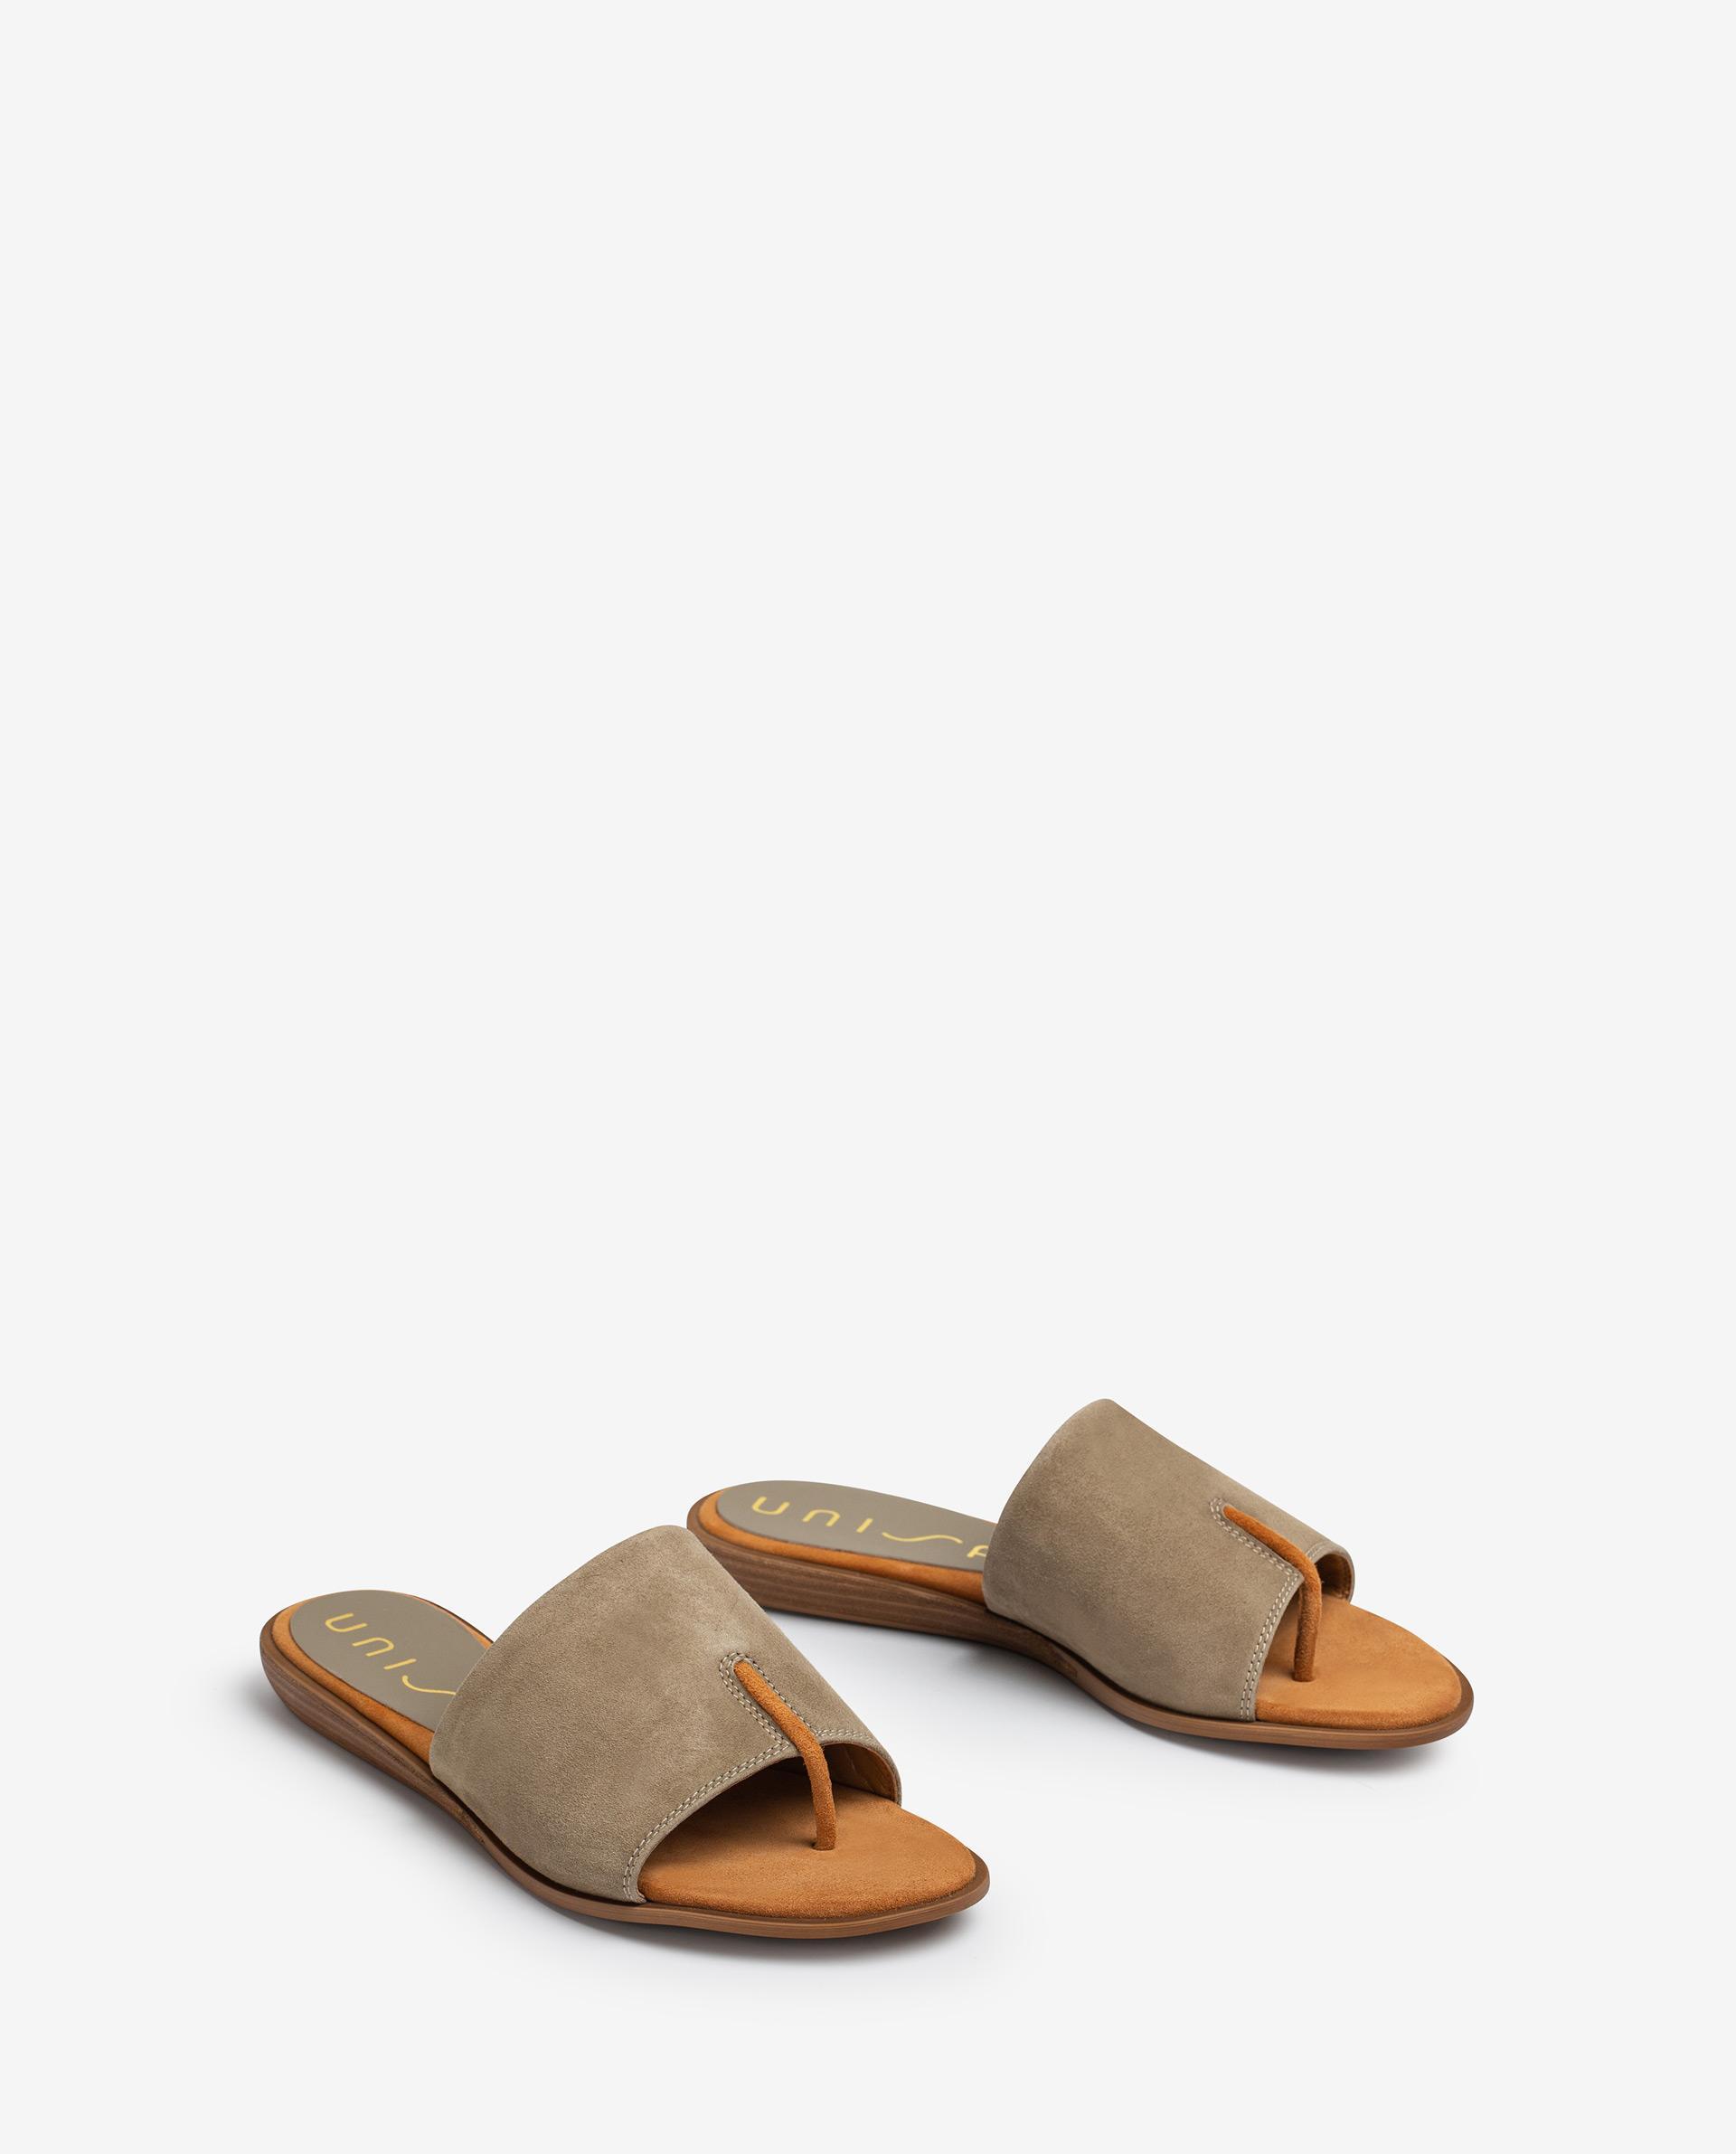 UNISA Thong type kid suede sandals ACHO_21_KS 2